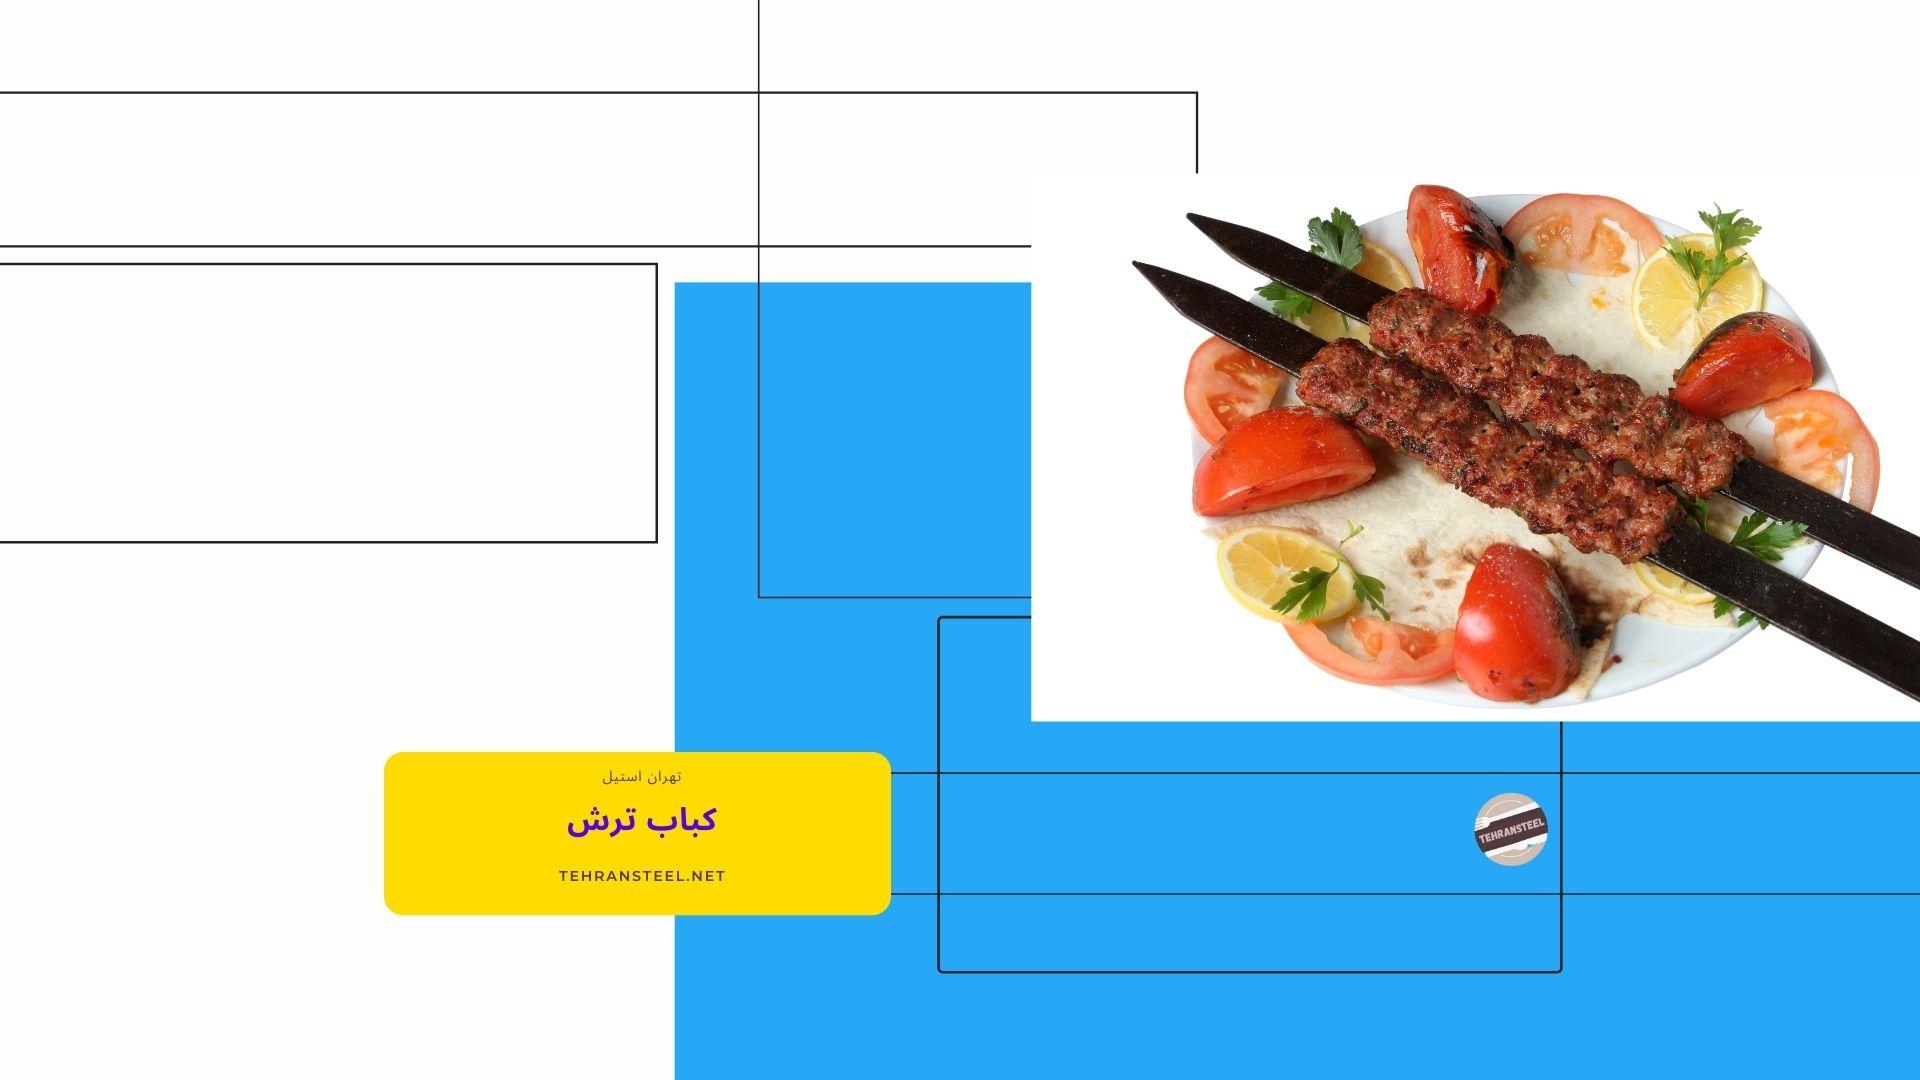 کباب ترش: